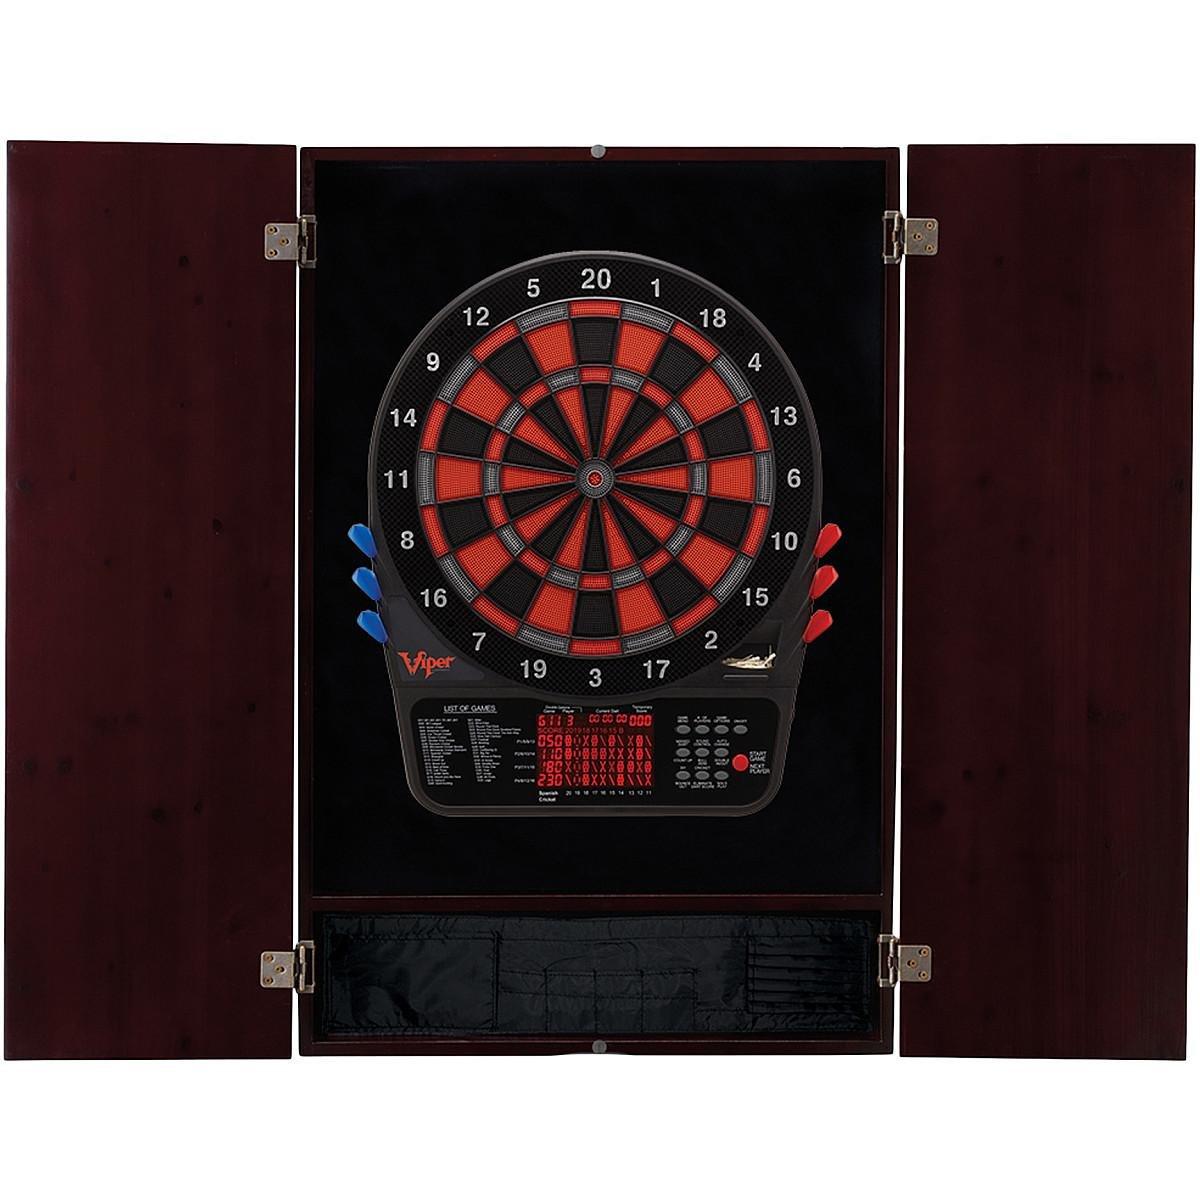 Viper 800 Electronic Dartboard & Metropolitan Mahogany Finish Cabinet